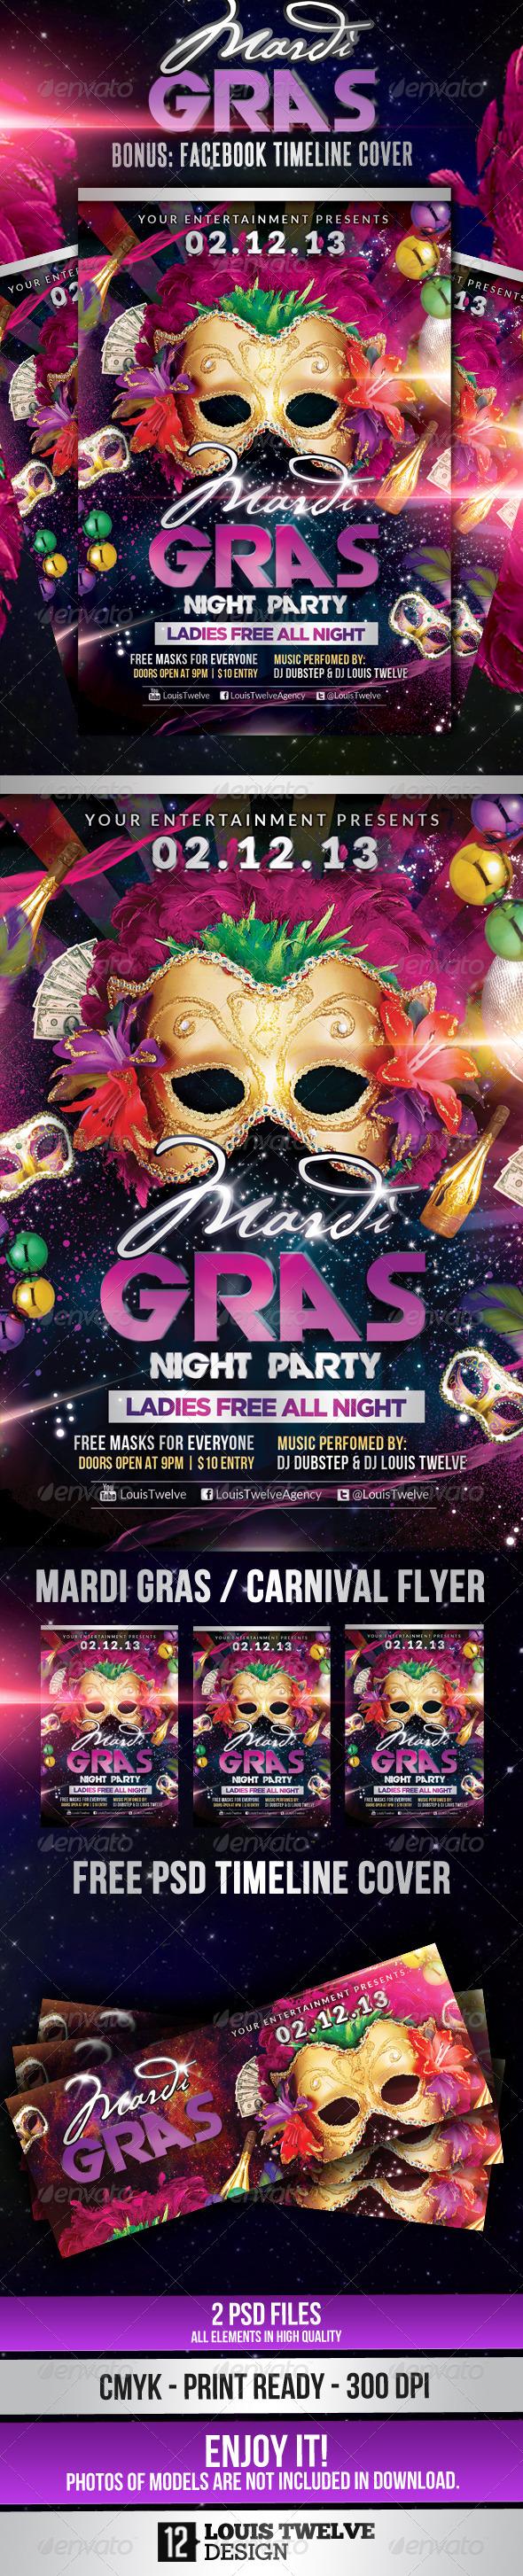 GraphicRiver Mardi Gras Carnival Party Flyer & Fb Cover 3780329